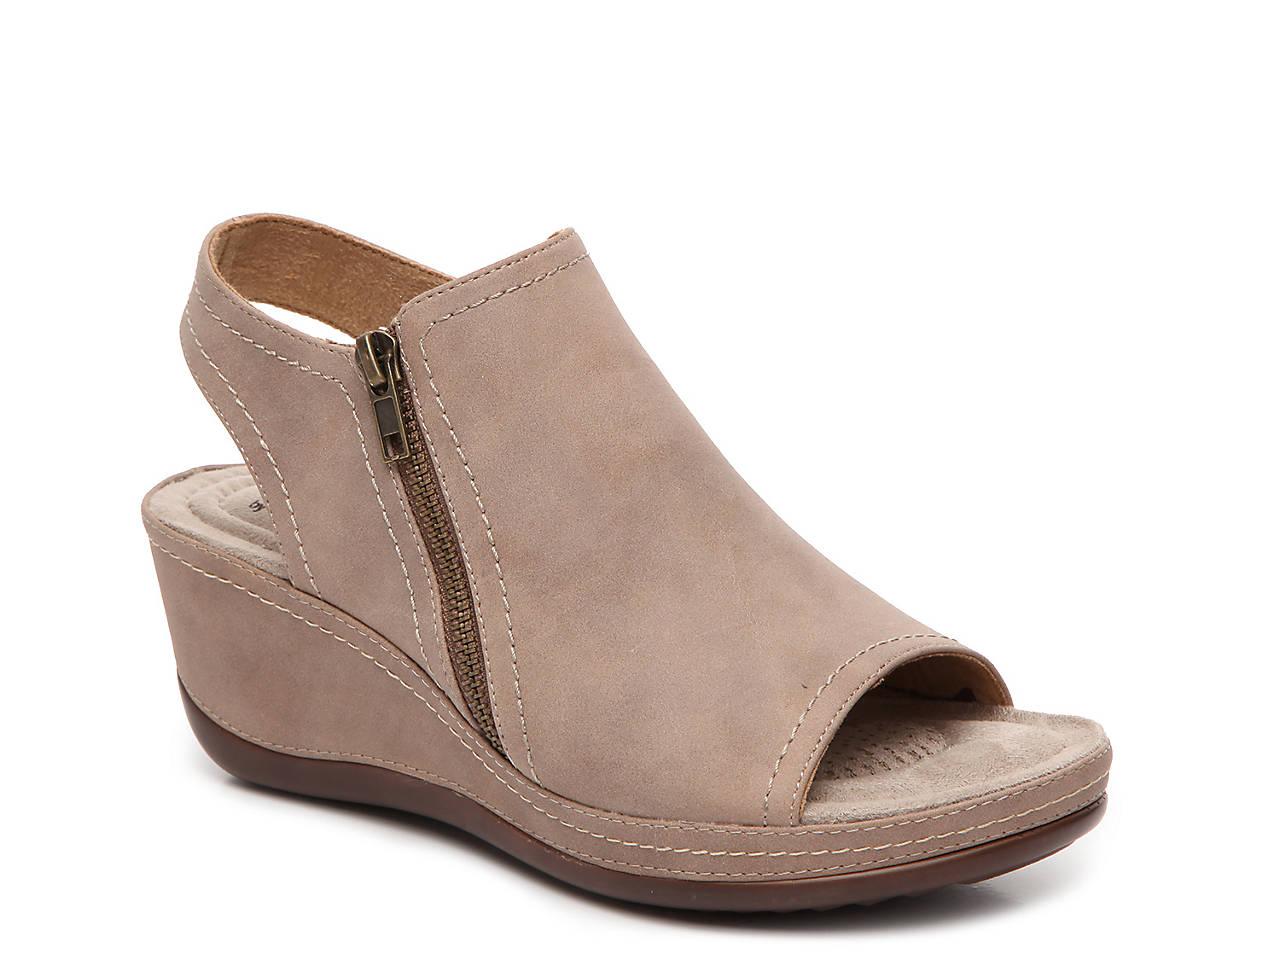 1d39e96797793 Cliffs by White Mountain Farrell Wedge Sandal Women s Shoes